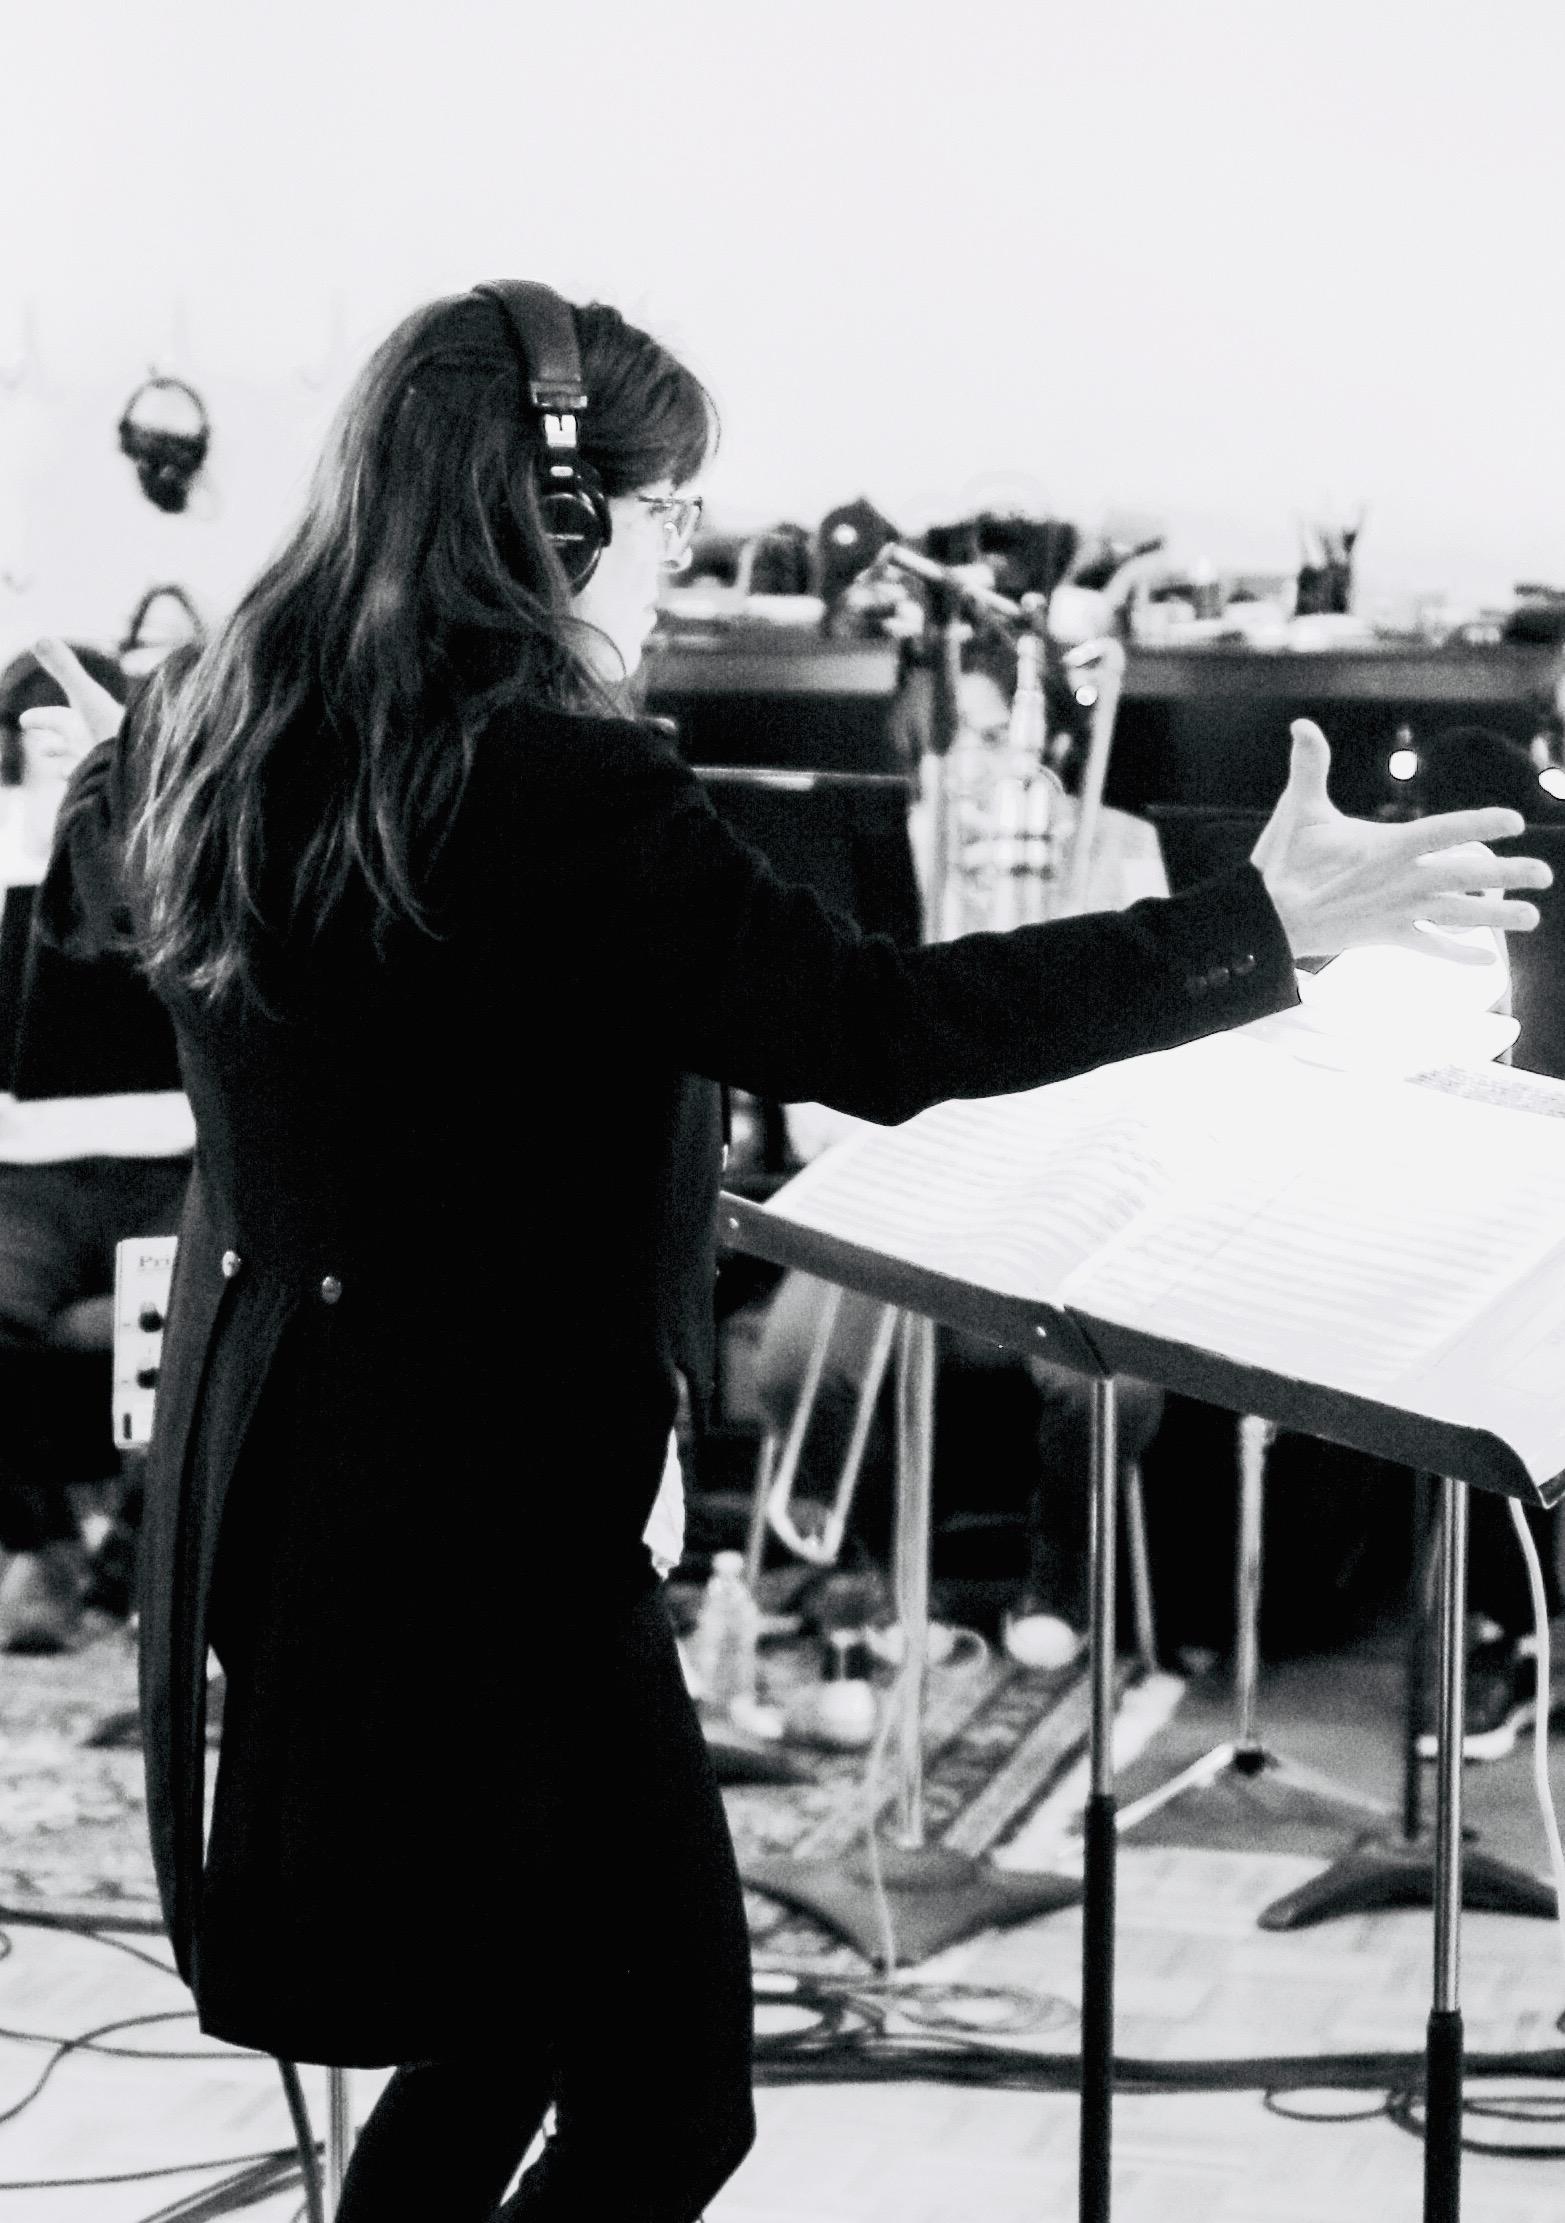 Maestro... photo: Sandrine Lee